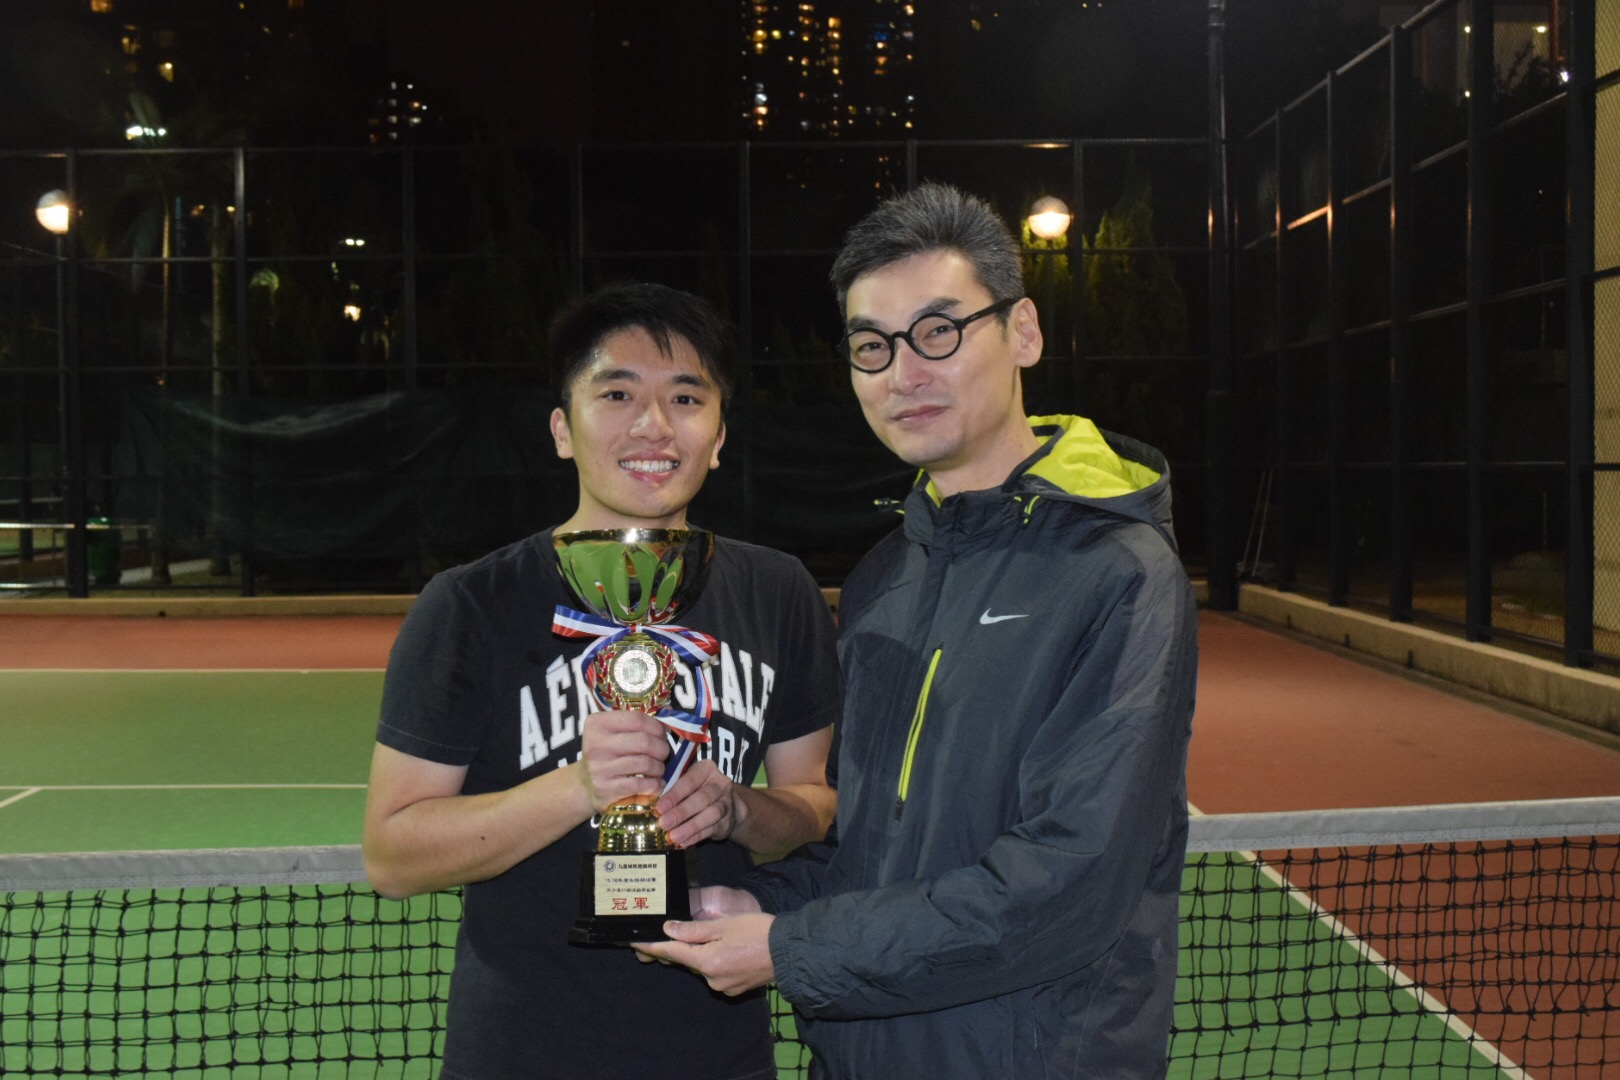 Champion Henman